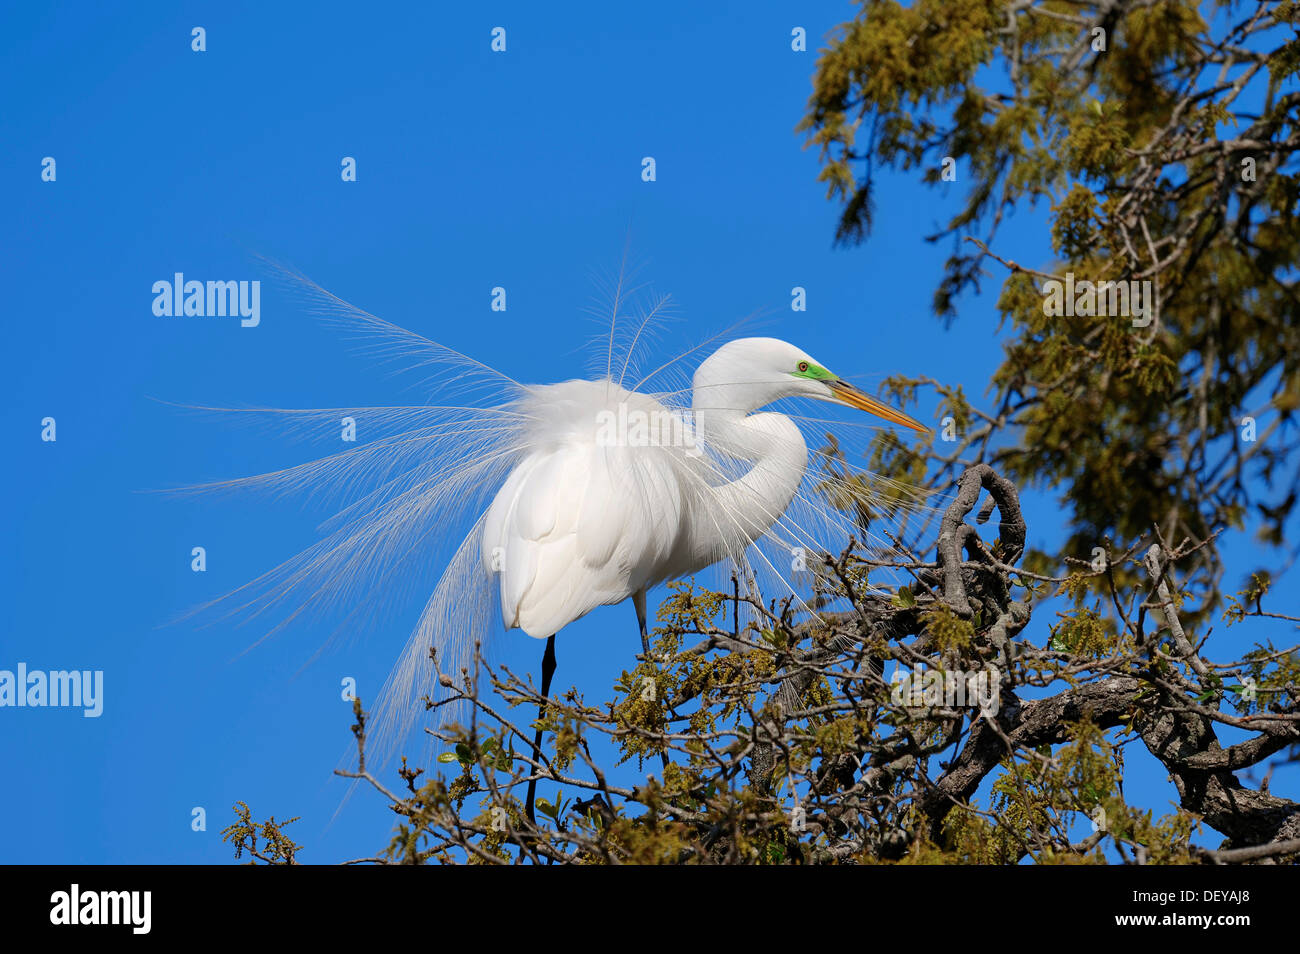 Great Egret (Casmerodius albus, Egretta alba), courtship display, Florida, United States Stock Photo